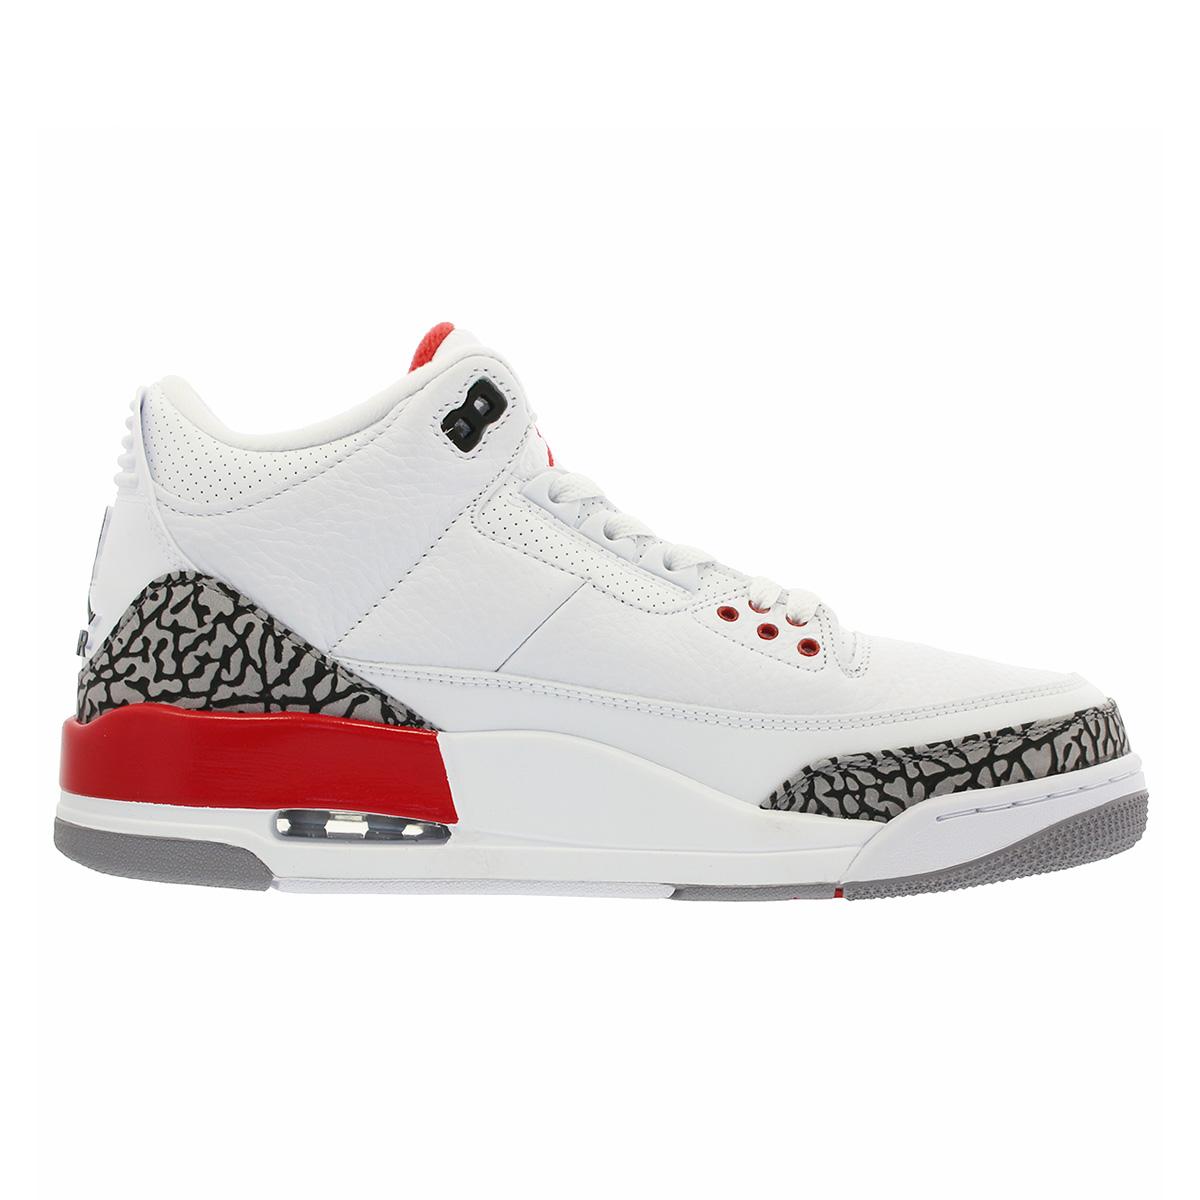 pretty nice 6f811 e3cee NIKE AIR JORDAN 3 RETRO Nike Air Jordan 3 nostalgic WHITE/CEMENT GREY/FIRE  RED 136,064-116